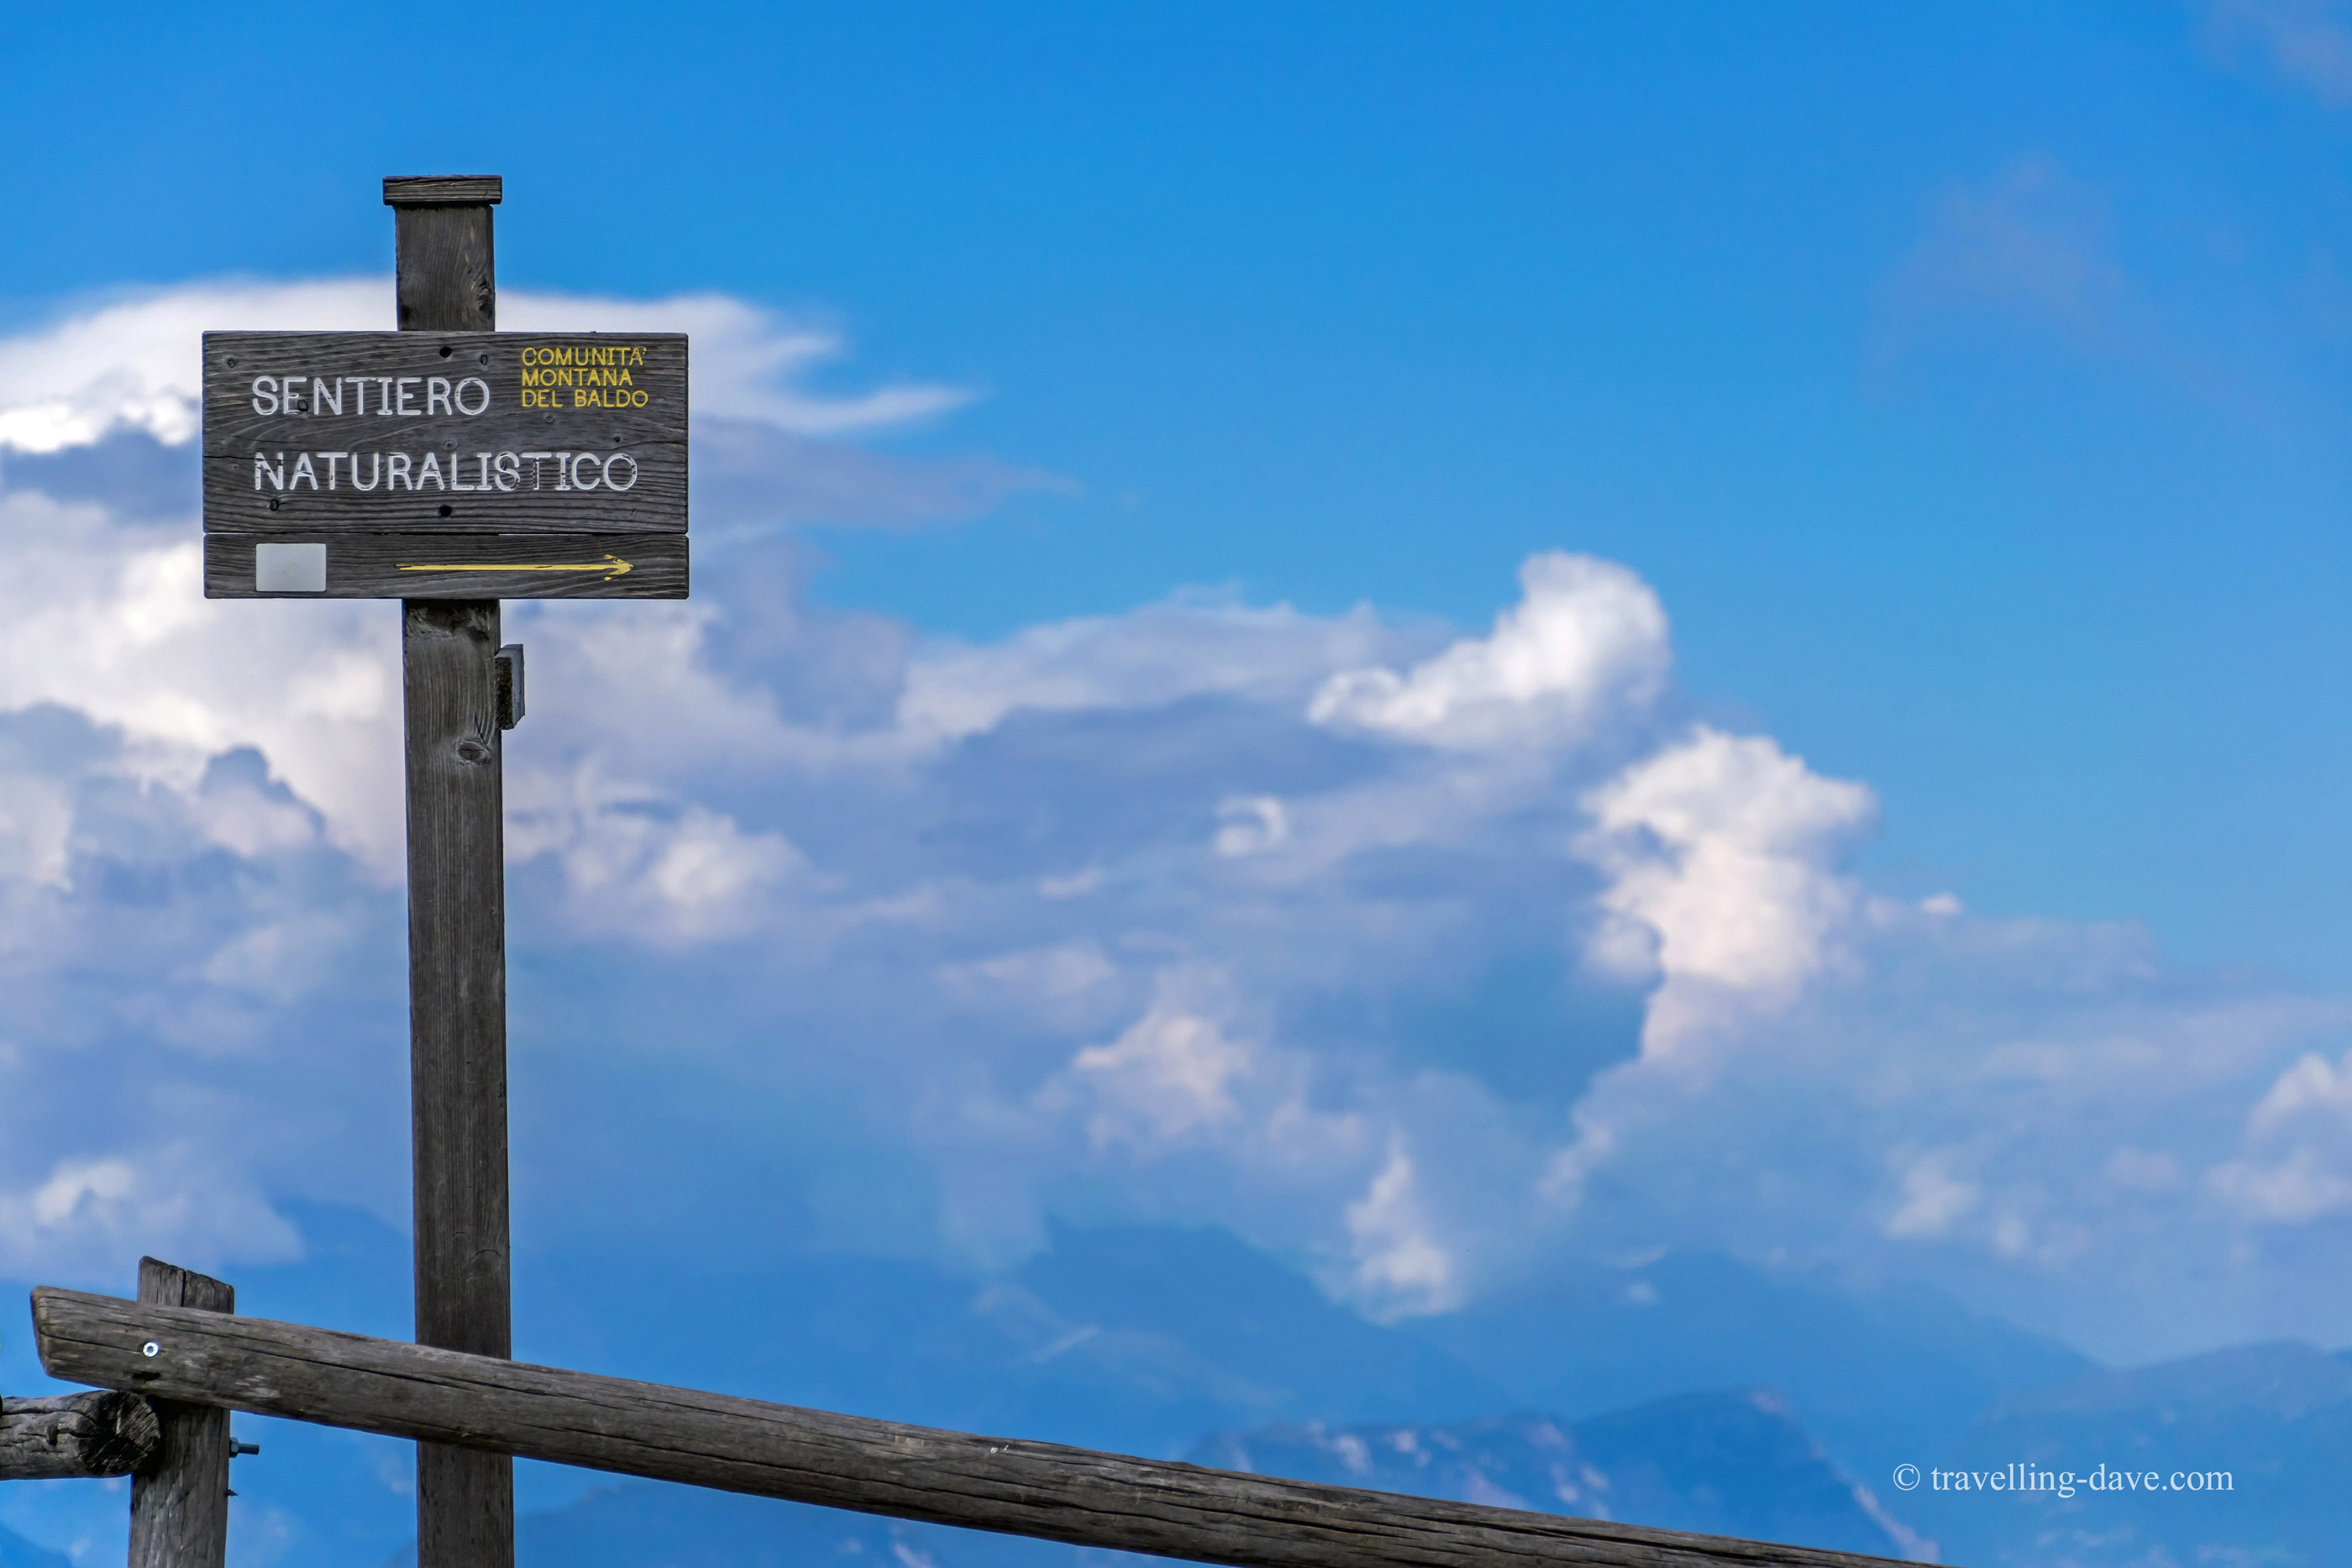 Monte Baldo hiking paths sign